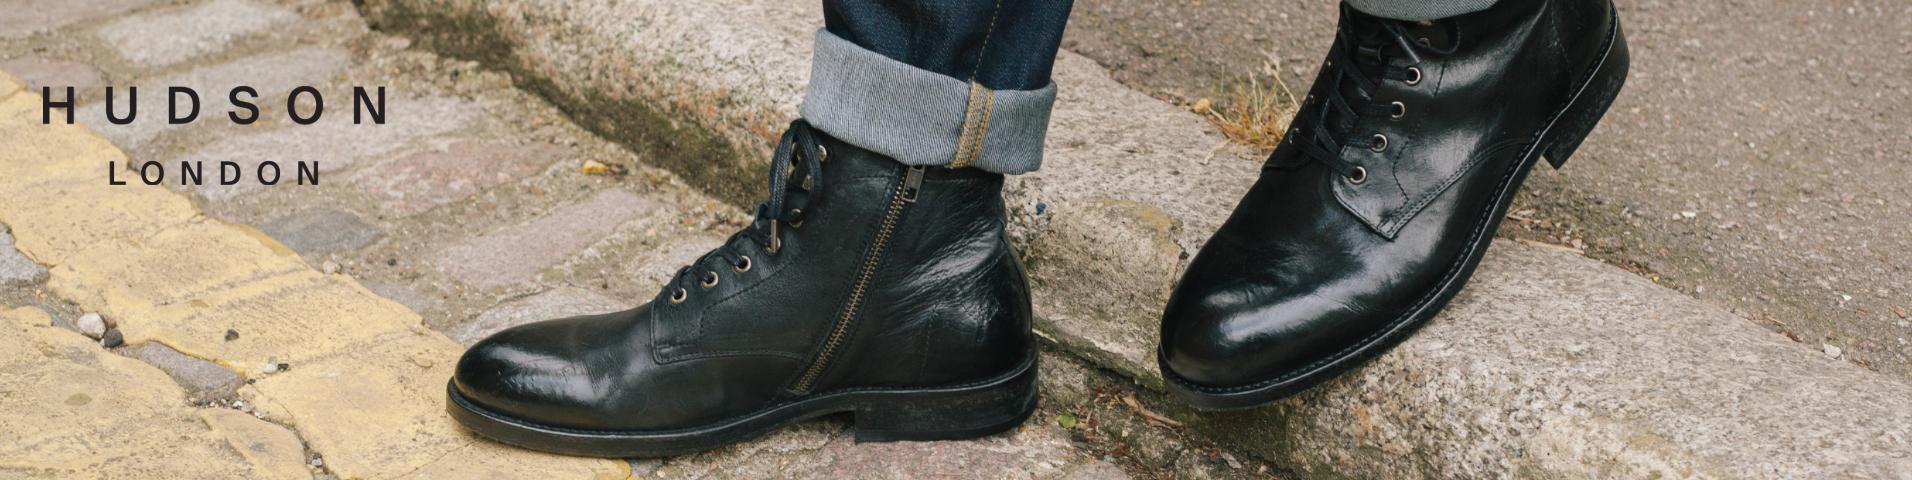 Hudson London Schuhe für Herren | ZALANDO